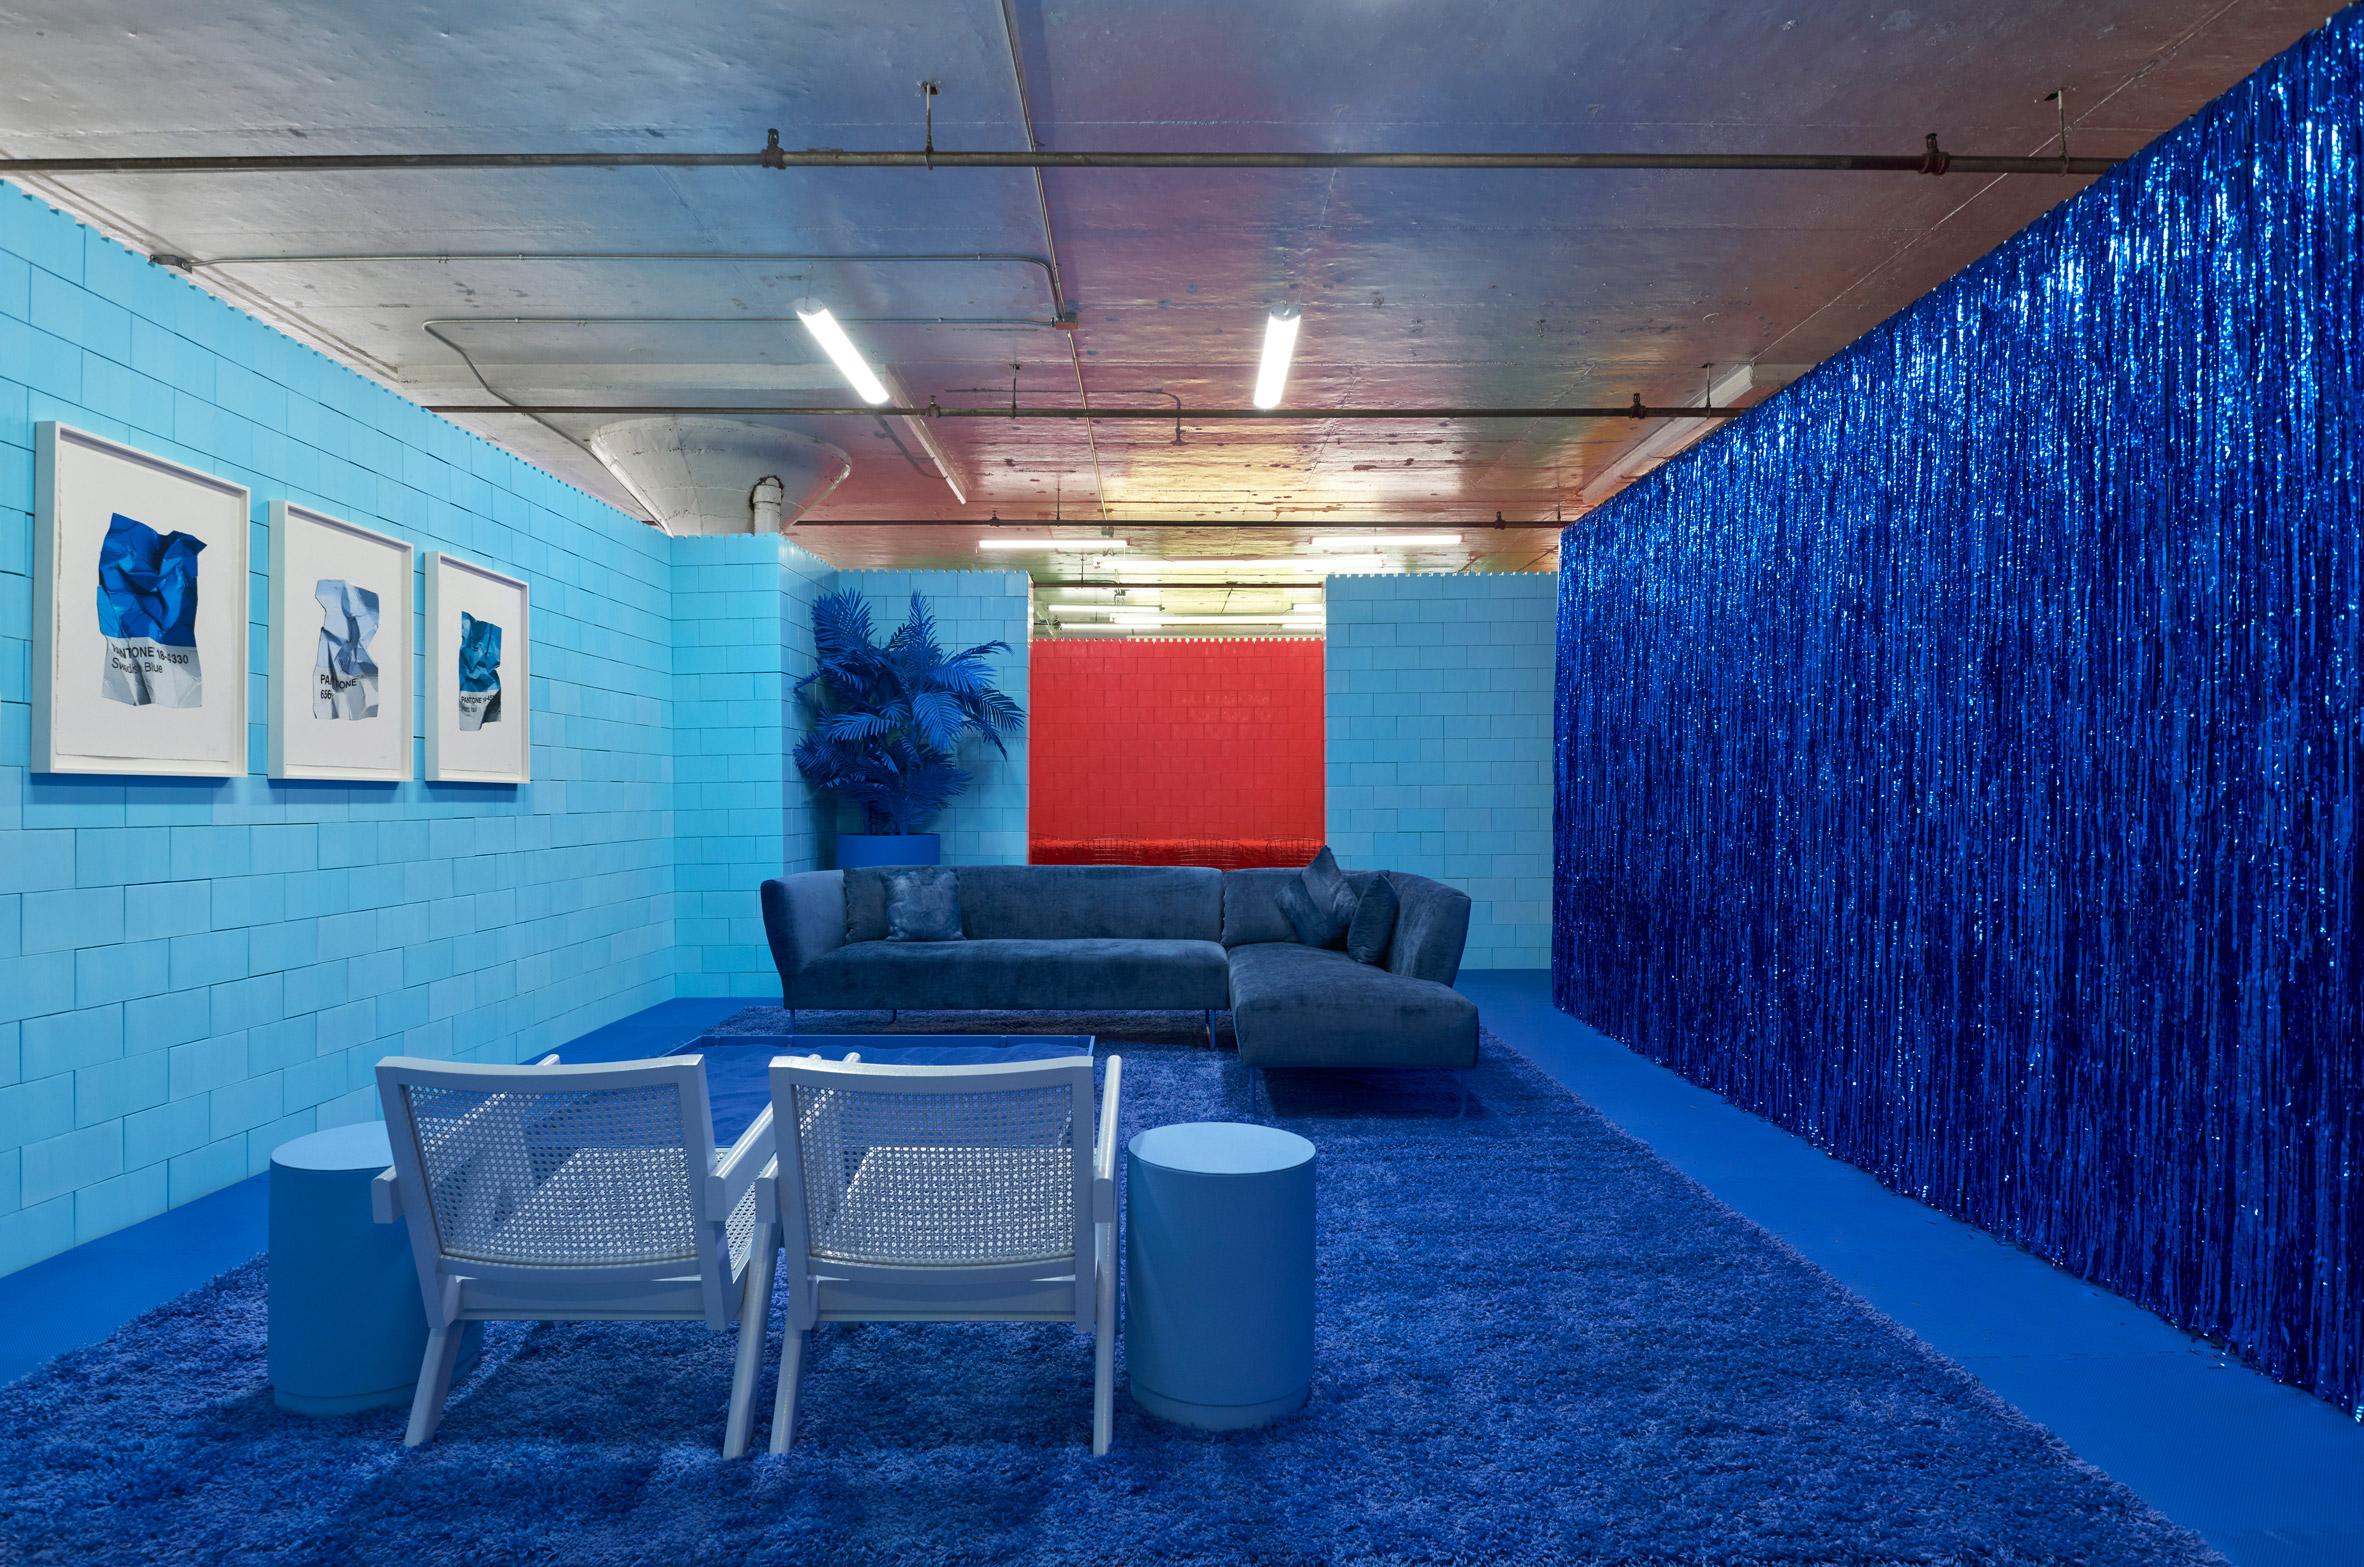 monochrome-cj-hendry-brooklyn-exhibition-colour-rooms-new-york-usa_dezeen_2364_col_20.jpg